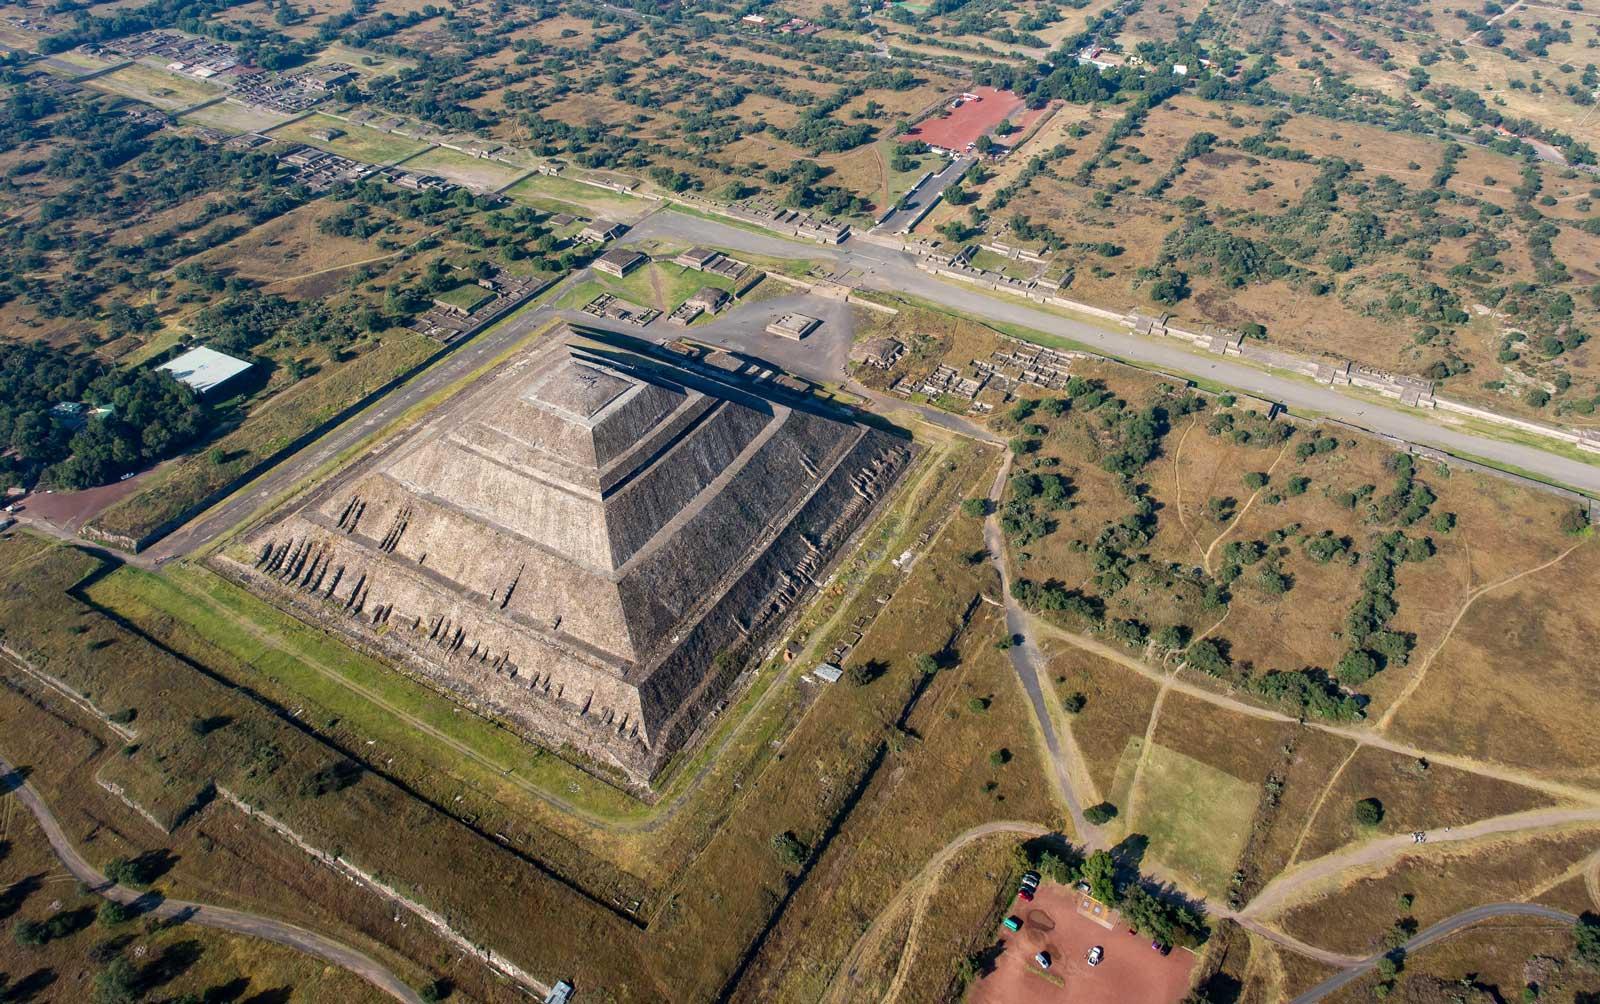 Sonnenpyramide in Teotihuacán von oben